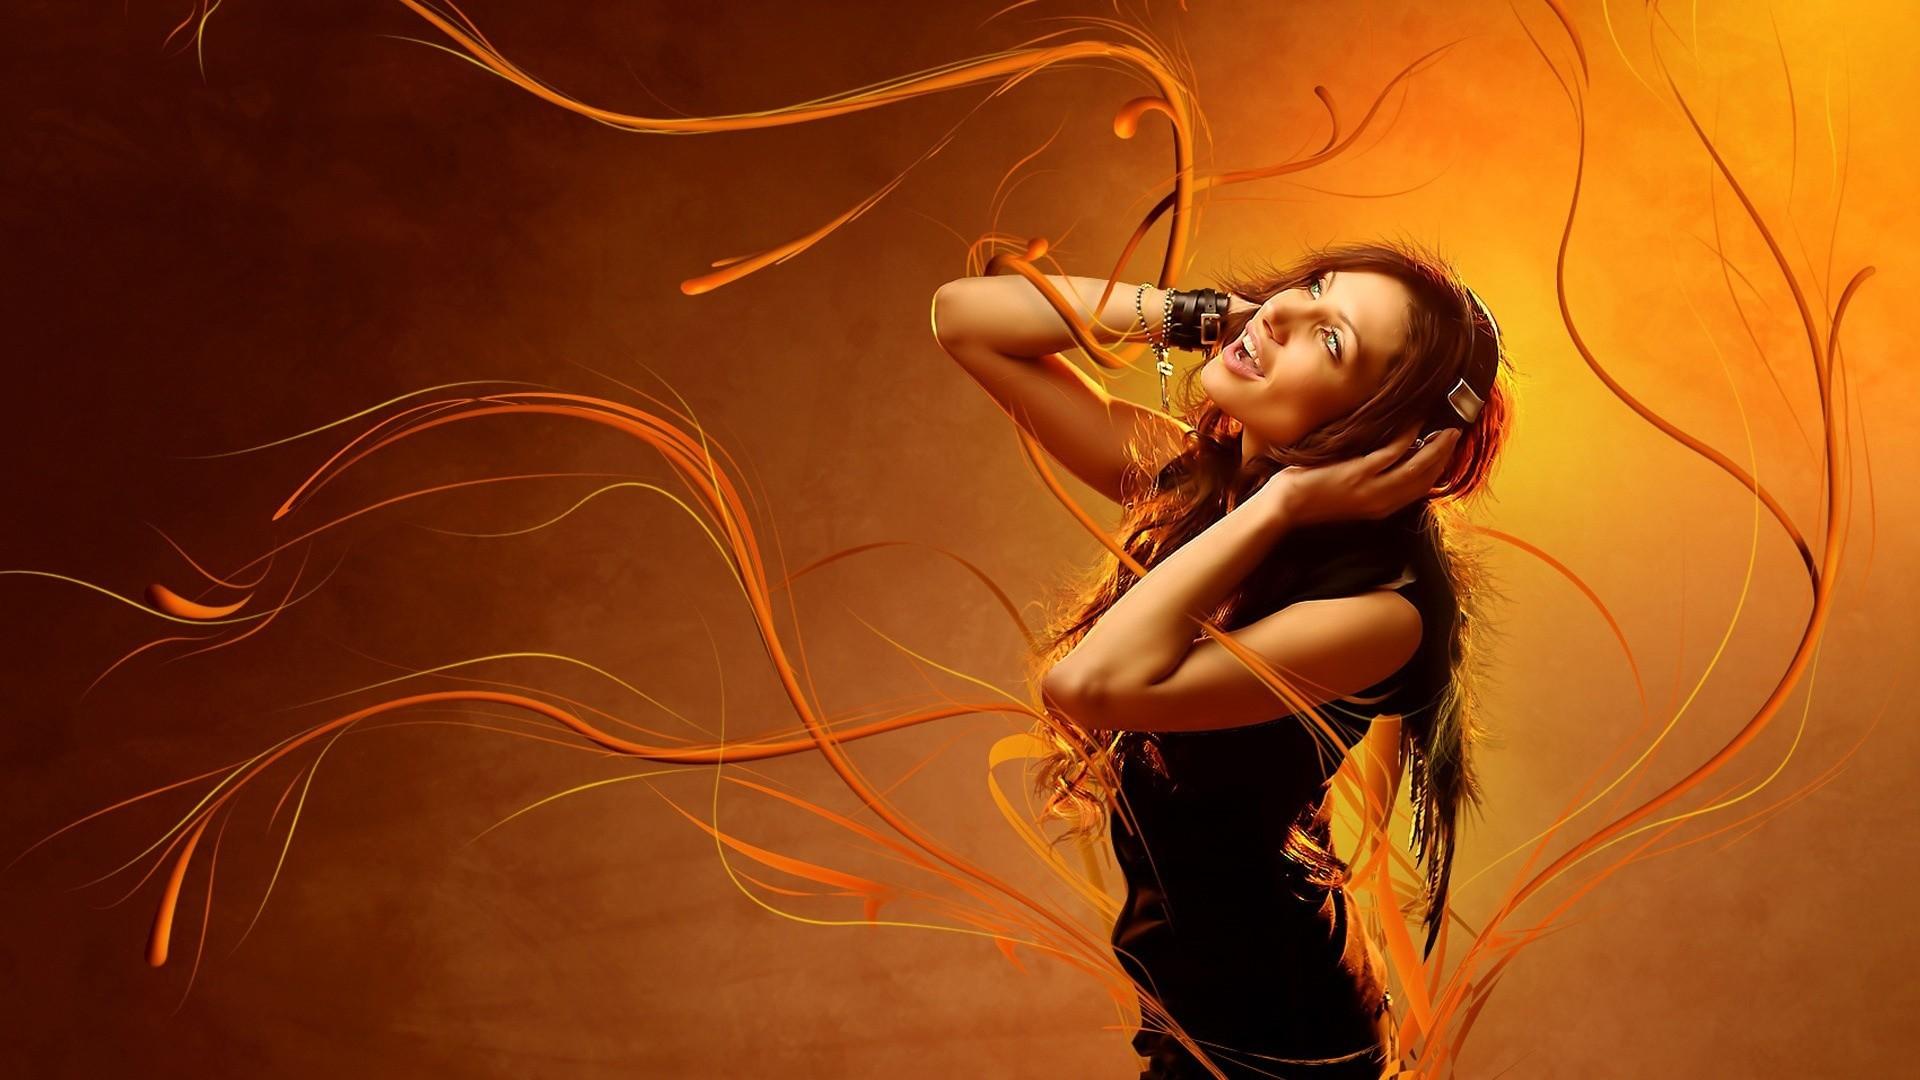 Free Dj Music Wallpapers HD Music Desktop Backgrounds – Follow Us On ..